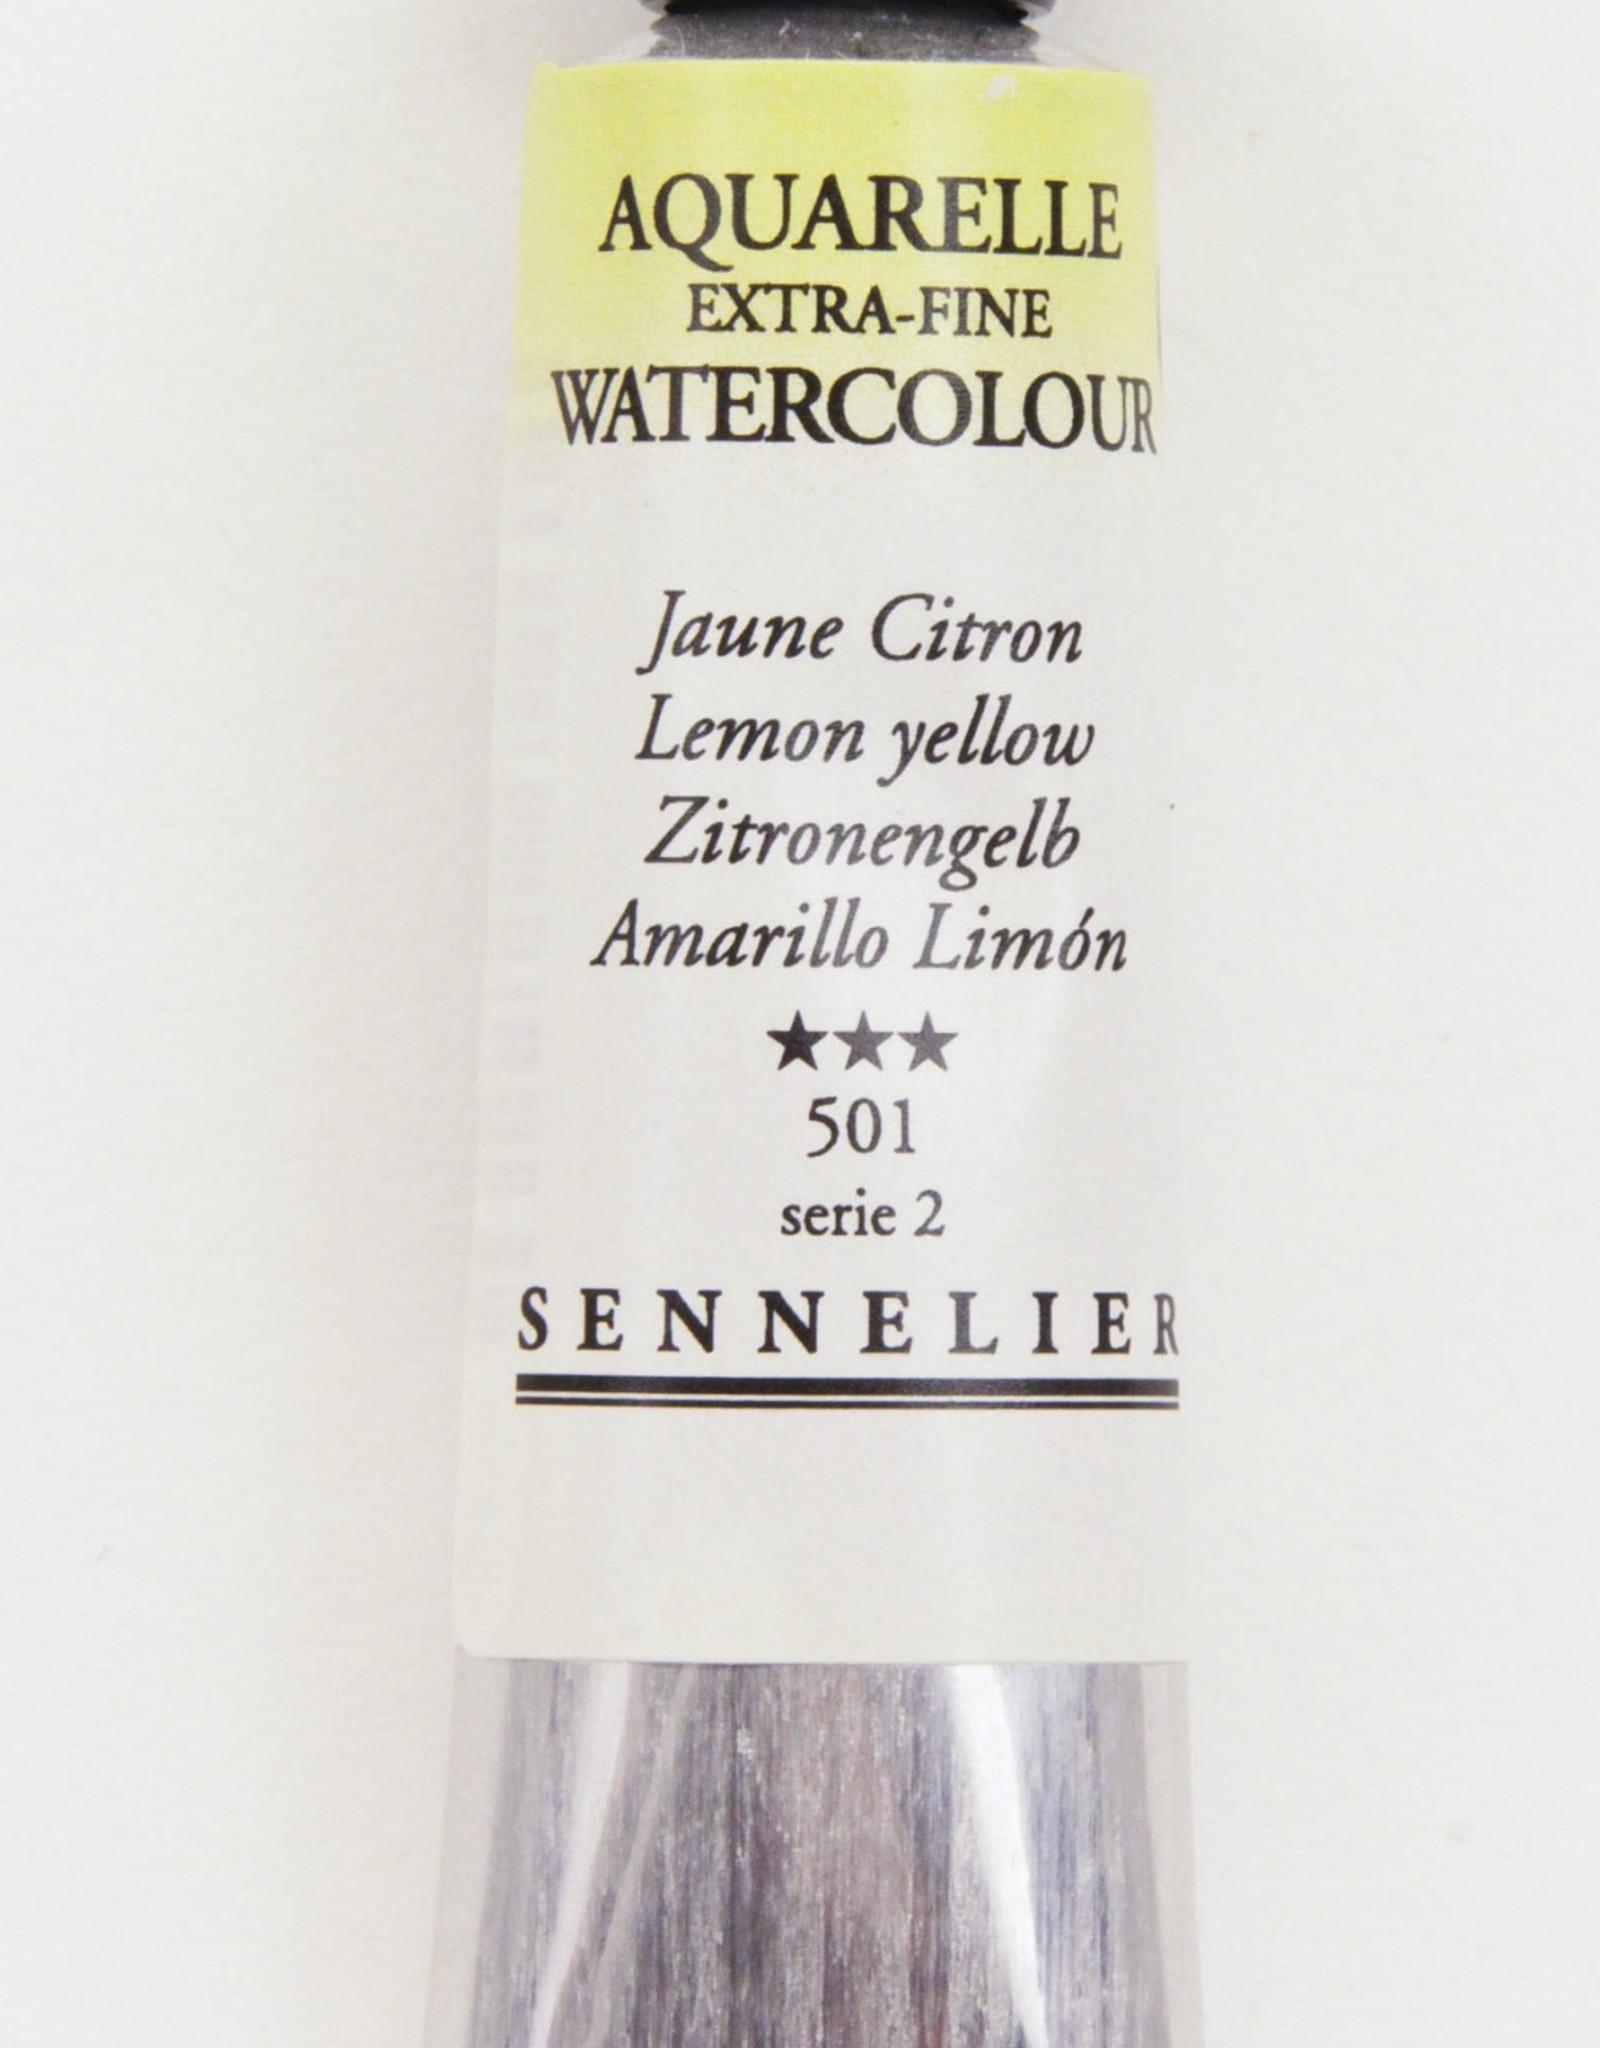 Sennelier, Aquarelle Watercolor Paint, Lemon Yellow, 501,10ml Tube, Series 1